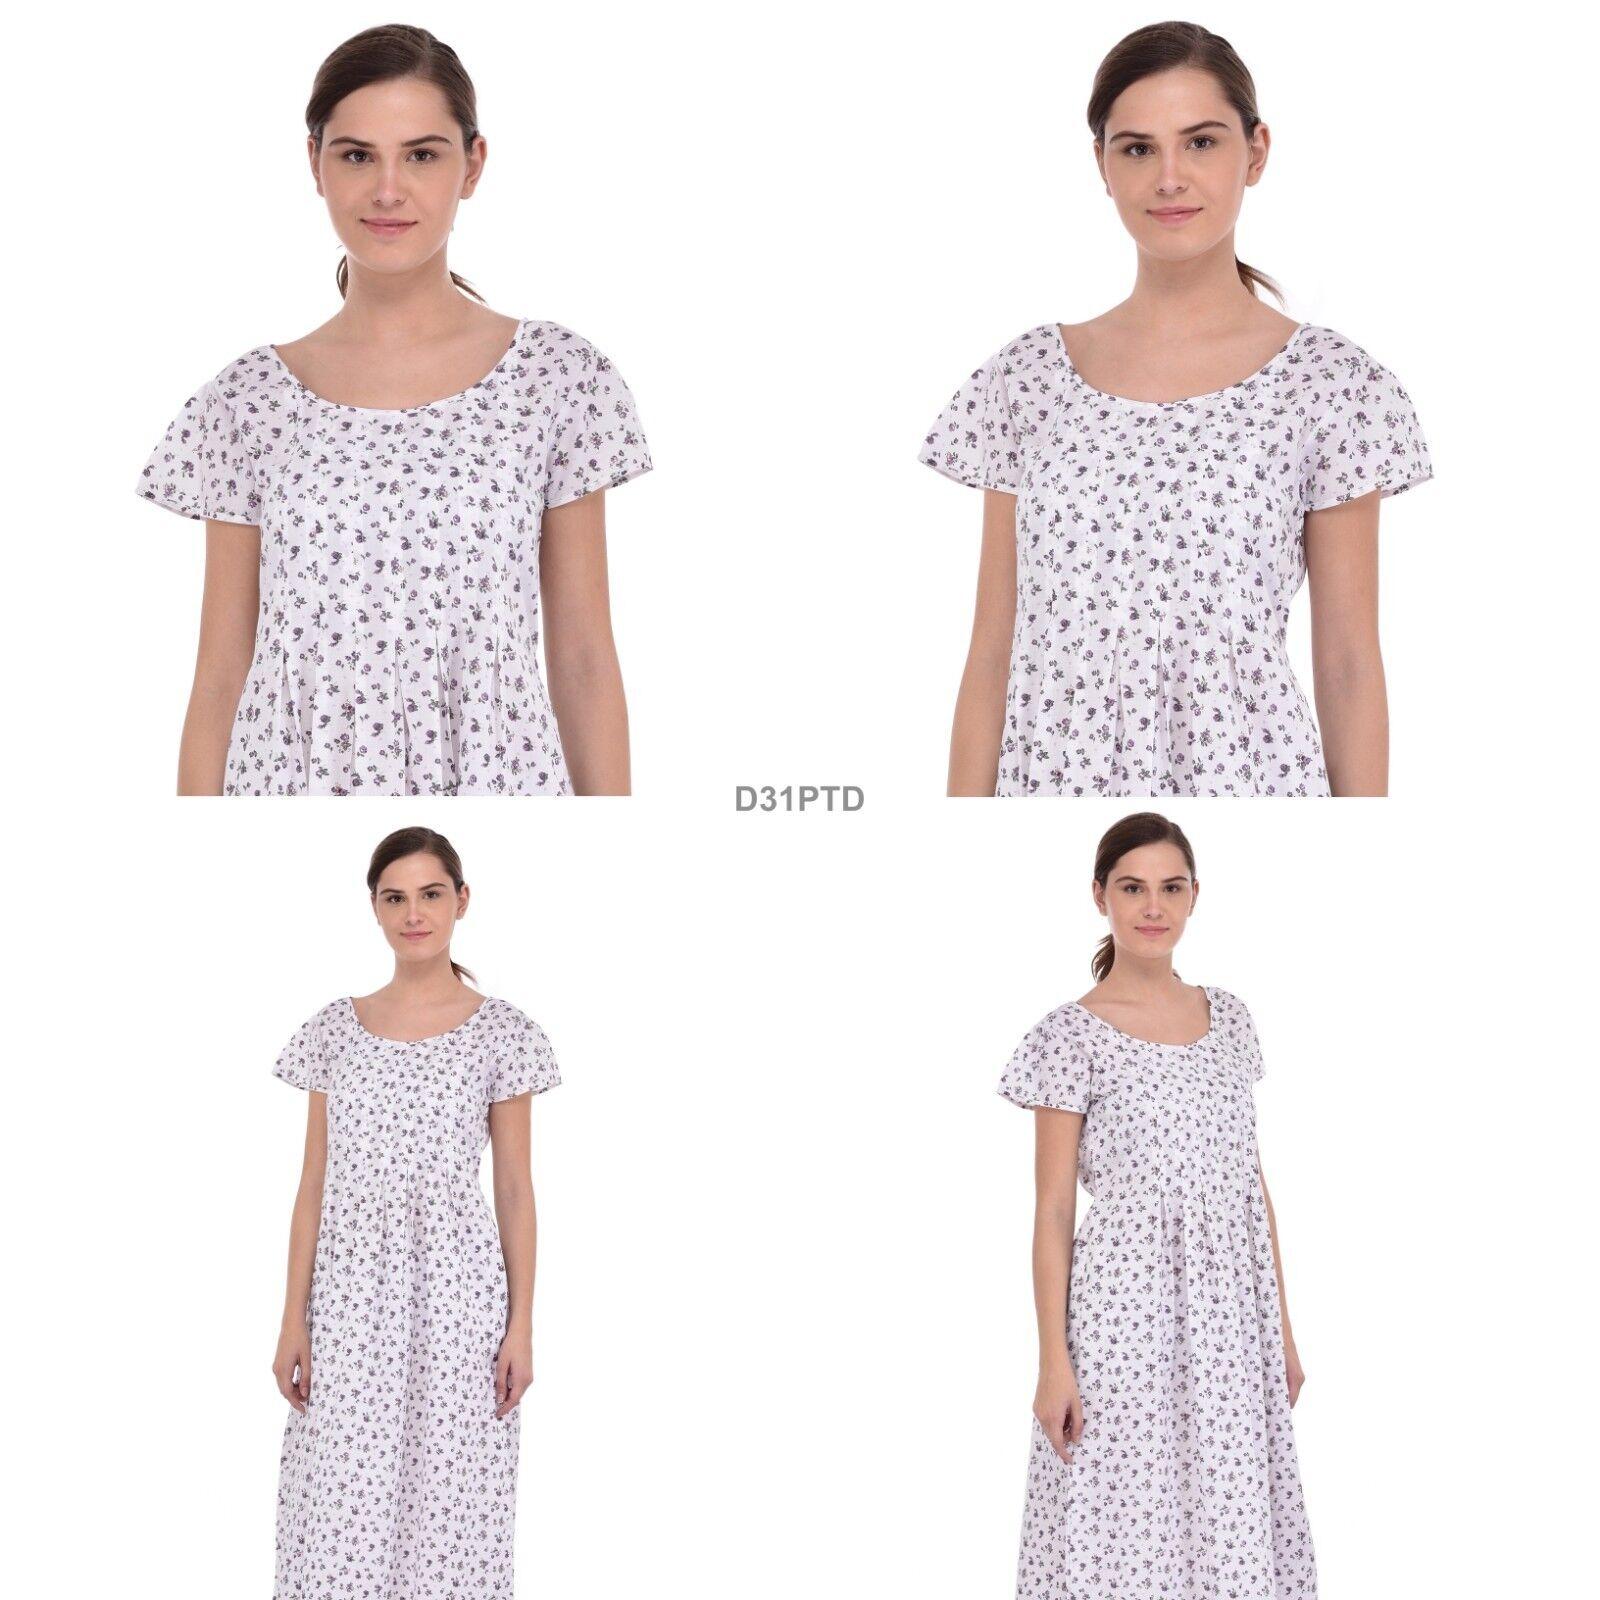 Cotton Cotton Cotton Lane Wrinkle-resistant Dress D31PTD. Sizes to 38 a49ff7